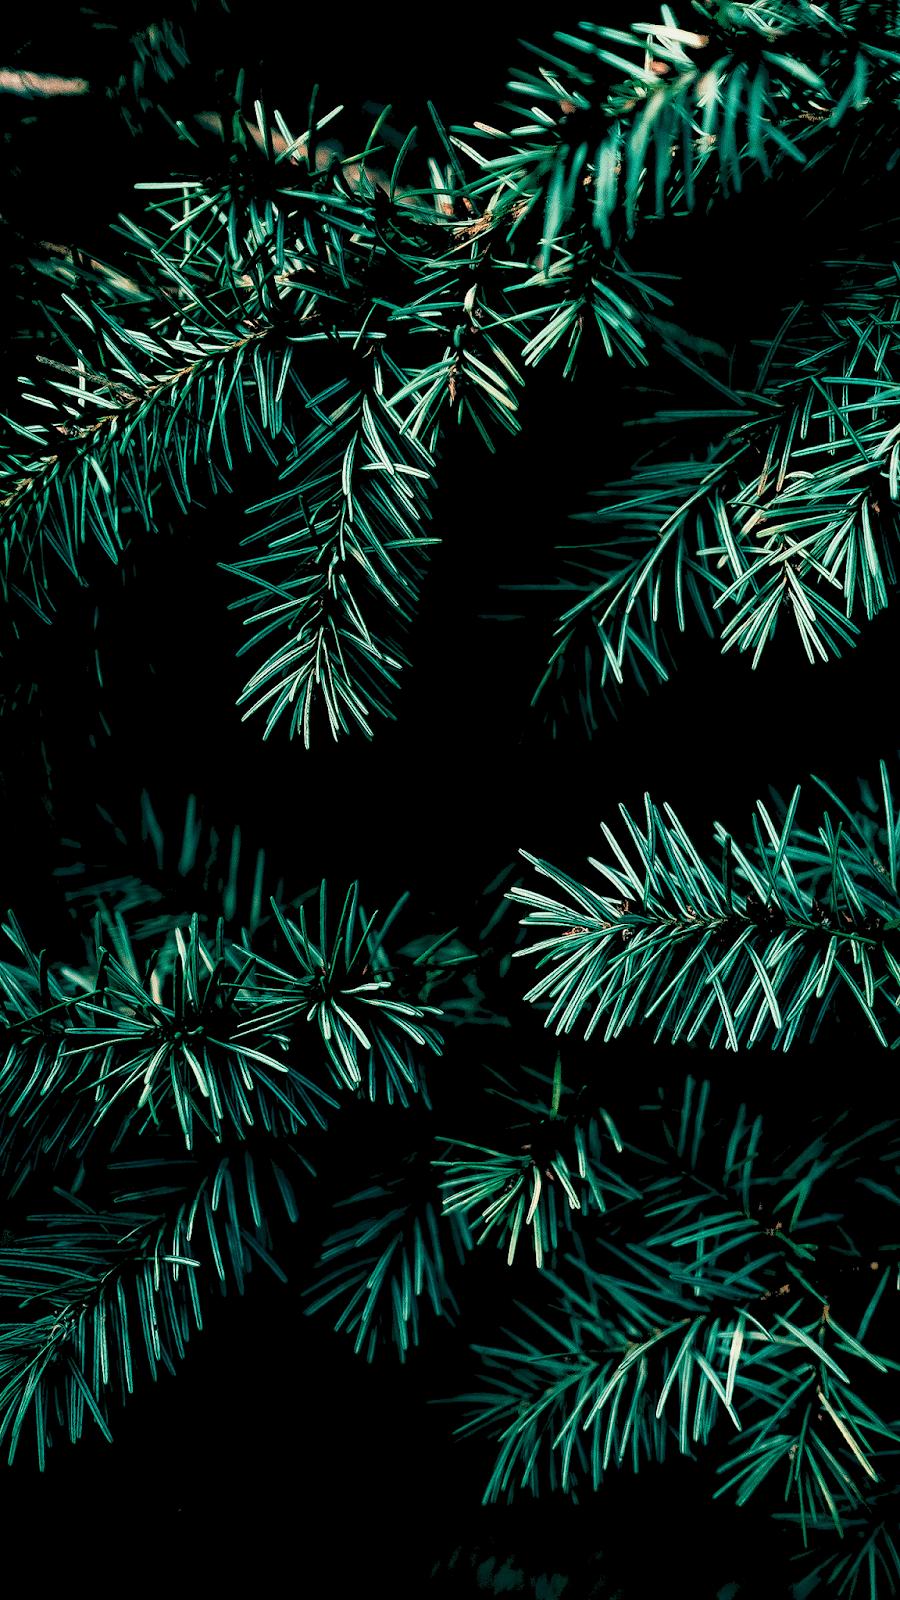 Christmas Vibe For Amoled Display Beautiful Wallpaper Iphone